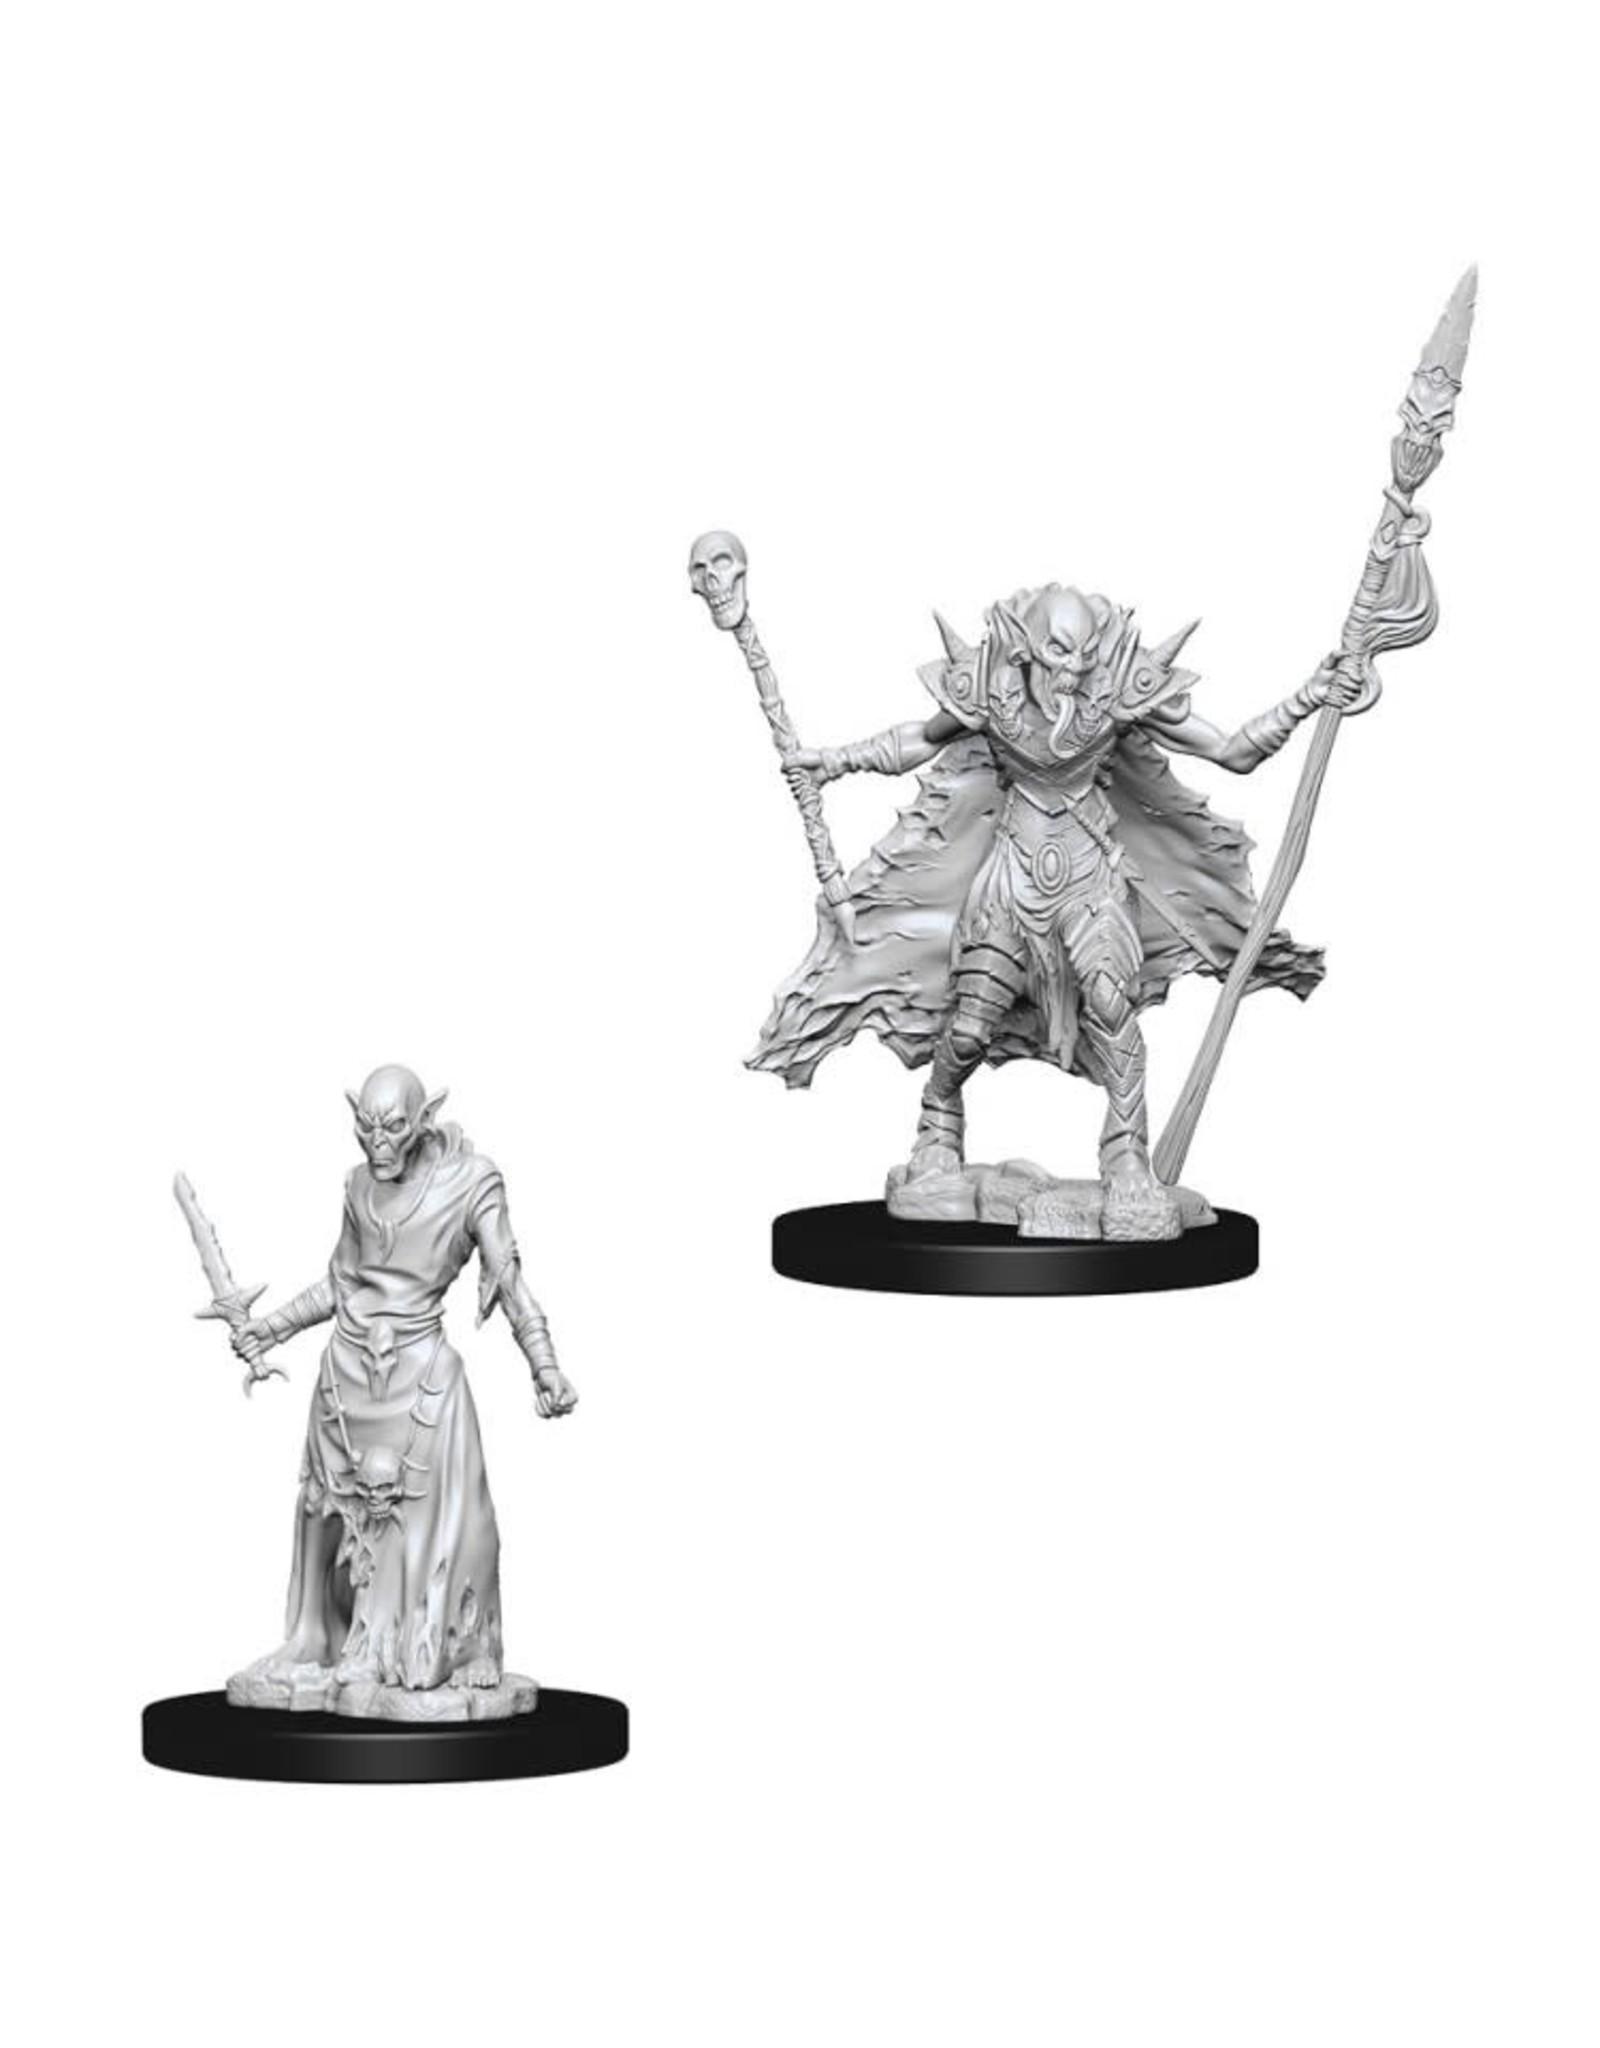 WizKids Pathfinder Minis (unpainted): Ghouls Wave 7, 73548